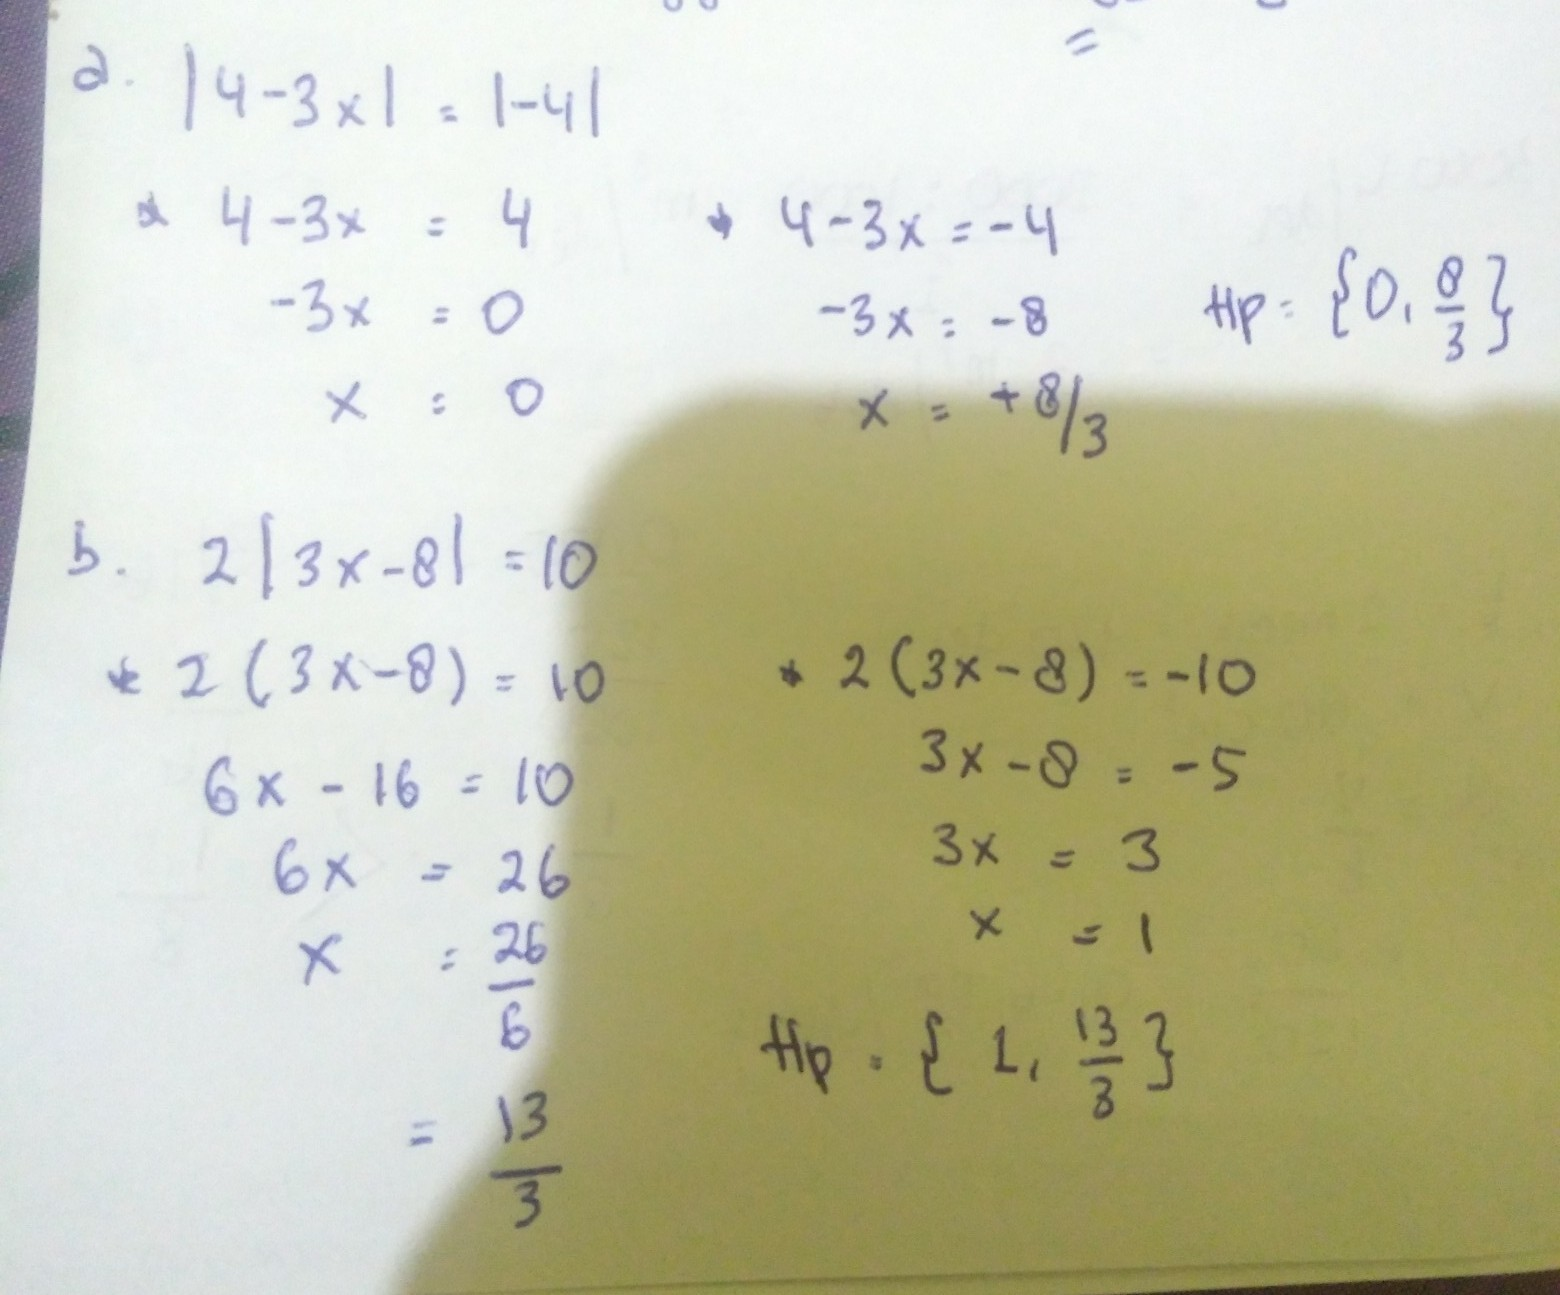 Hitunglah Nilai X Jika Ada Yang Memenuhi Persamaan Nilai Mutlak Berikut Jika Tidak Ada Nilai X Brainly Co Id